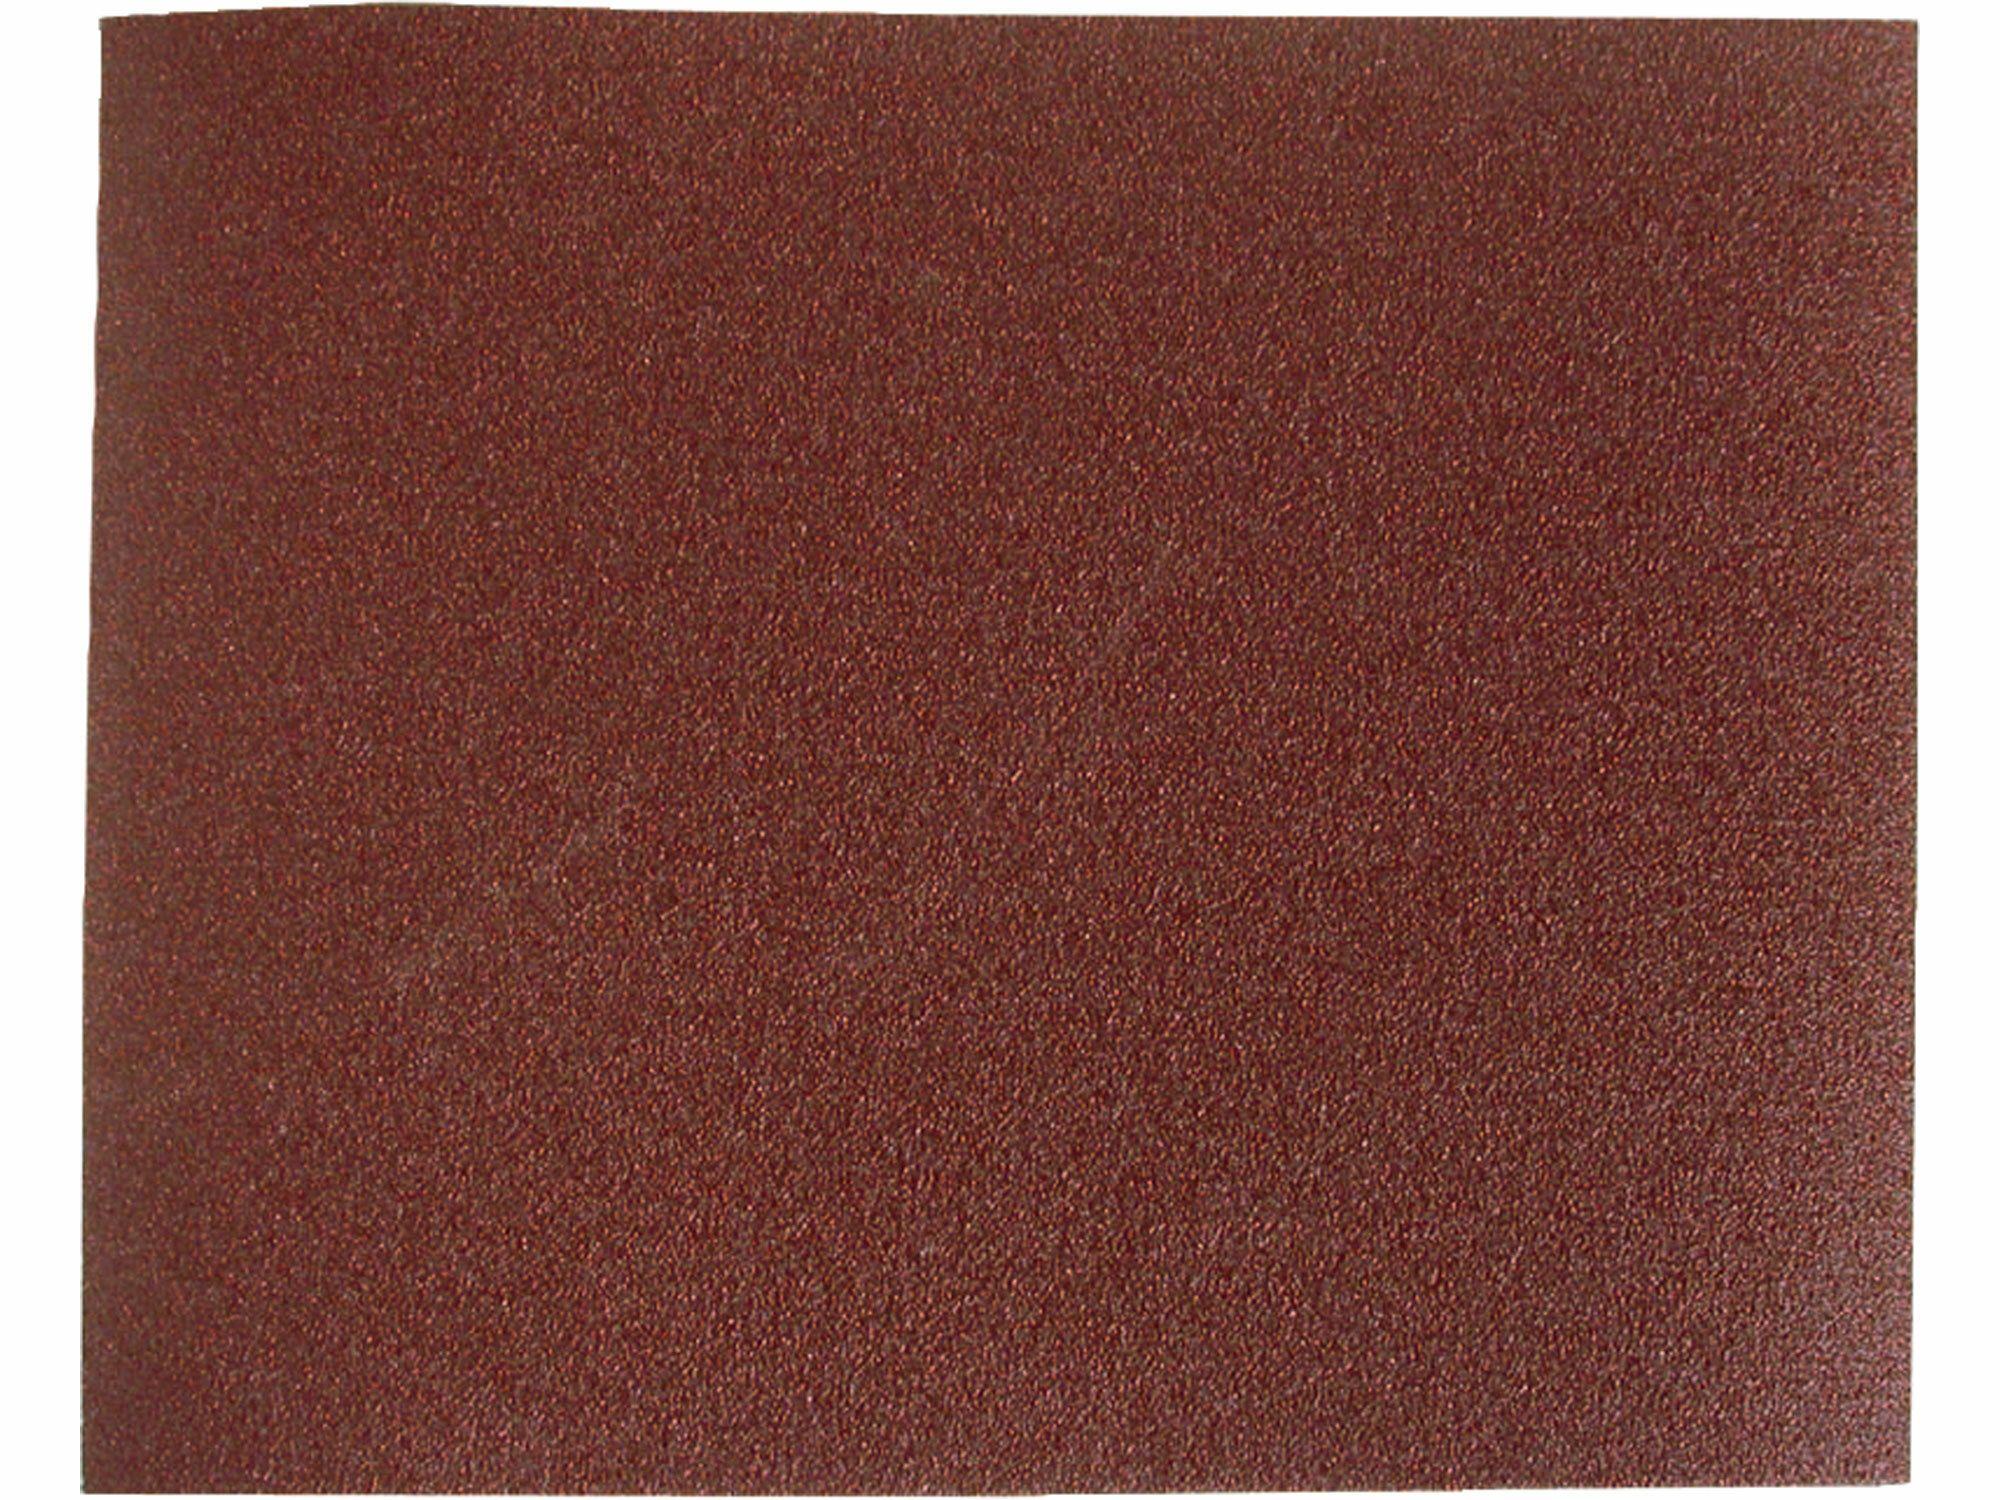 Plátno brusné archy ERSTA, bal. 10ks, 230x280mm, P120